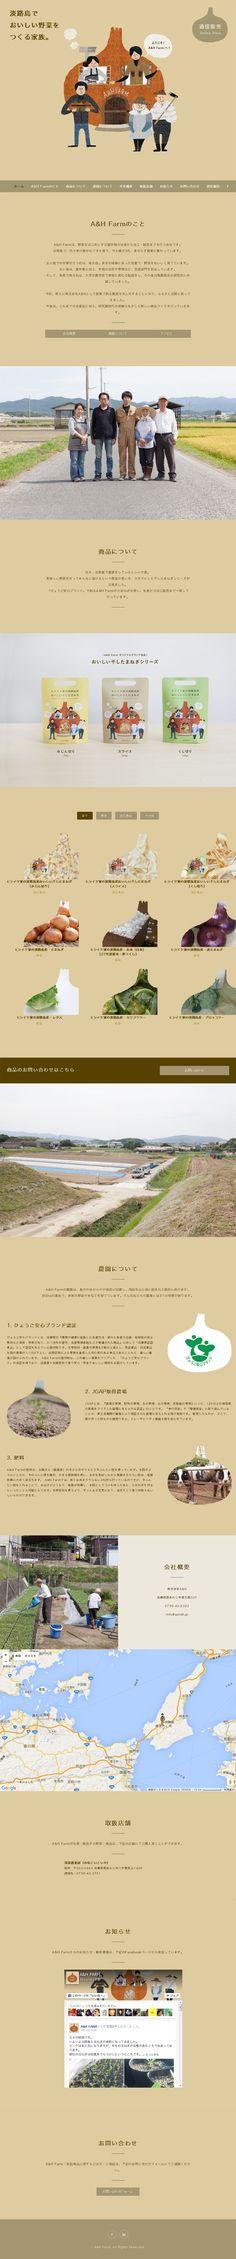 WEBデザイナーさん必見!ランディングページのデザイン参考に活用出来ます★ Web Japan, Art Web, Web Design Inspiration, Design Ideas, Japanese Design, Site Design, Banner Design, Editorial Design, Packaging Design